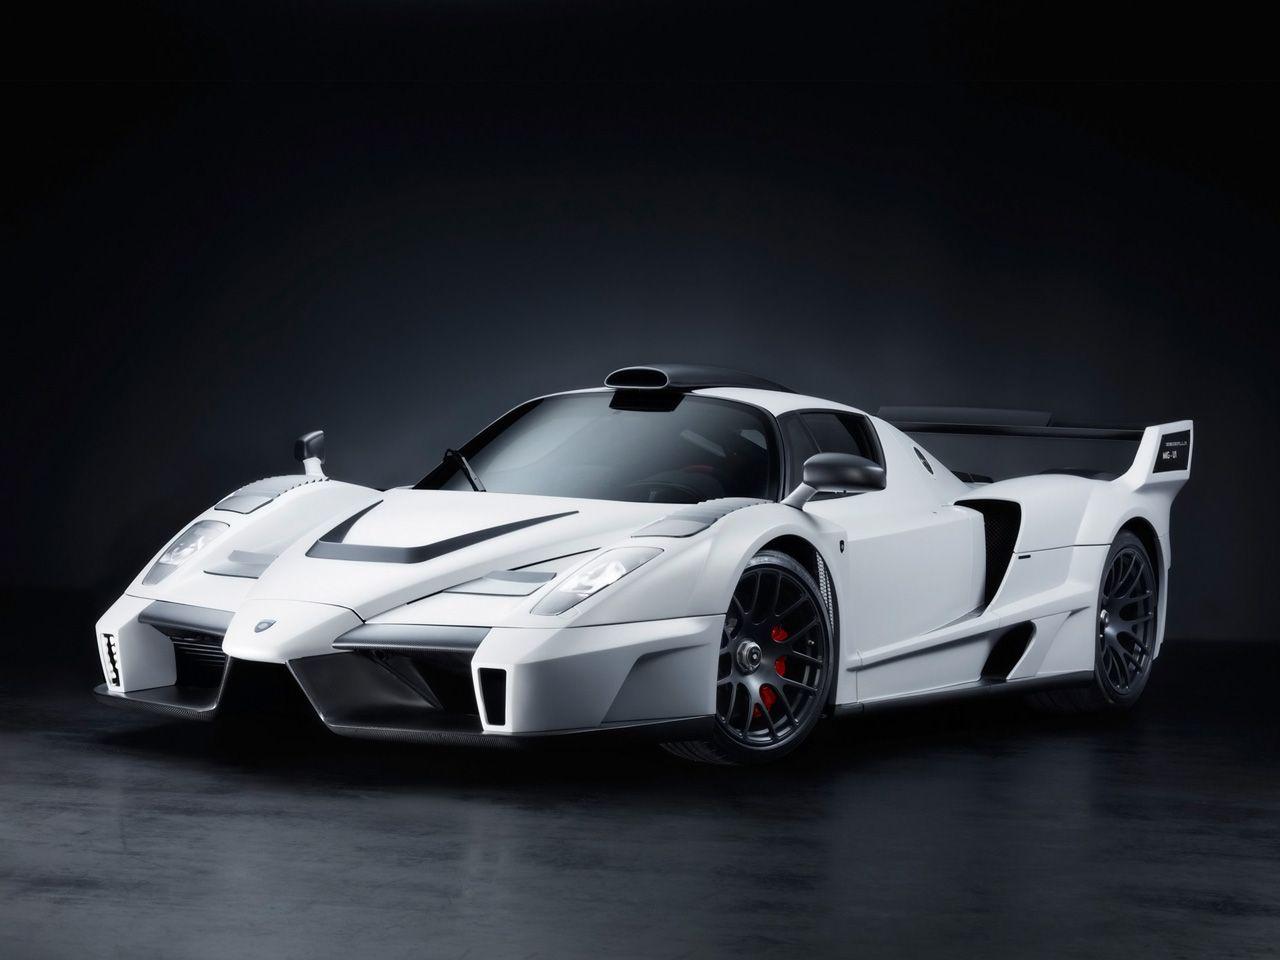 Etonnant Sports High Speed Ferrari Car Wallpapers